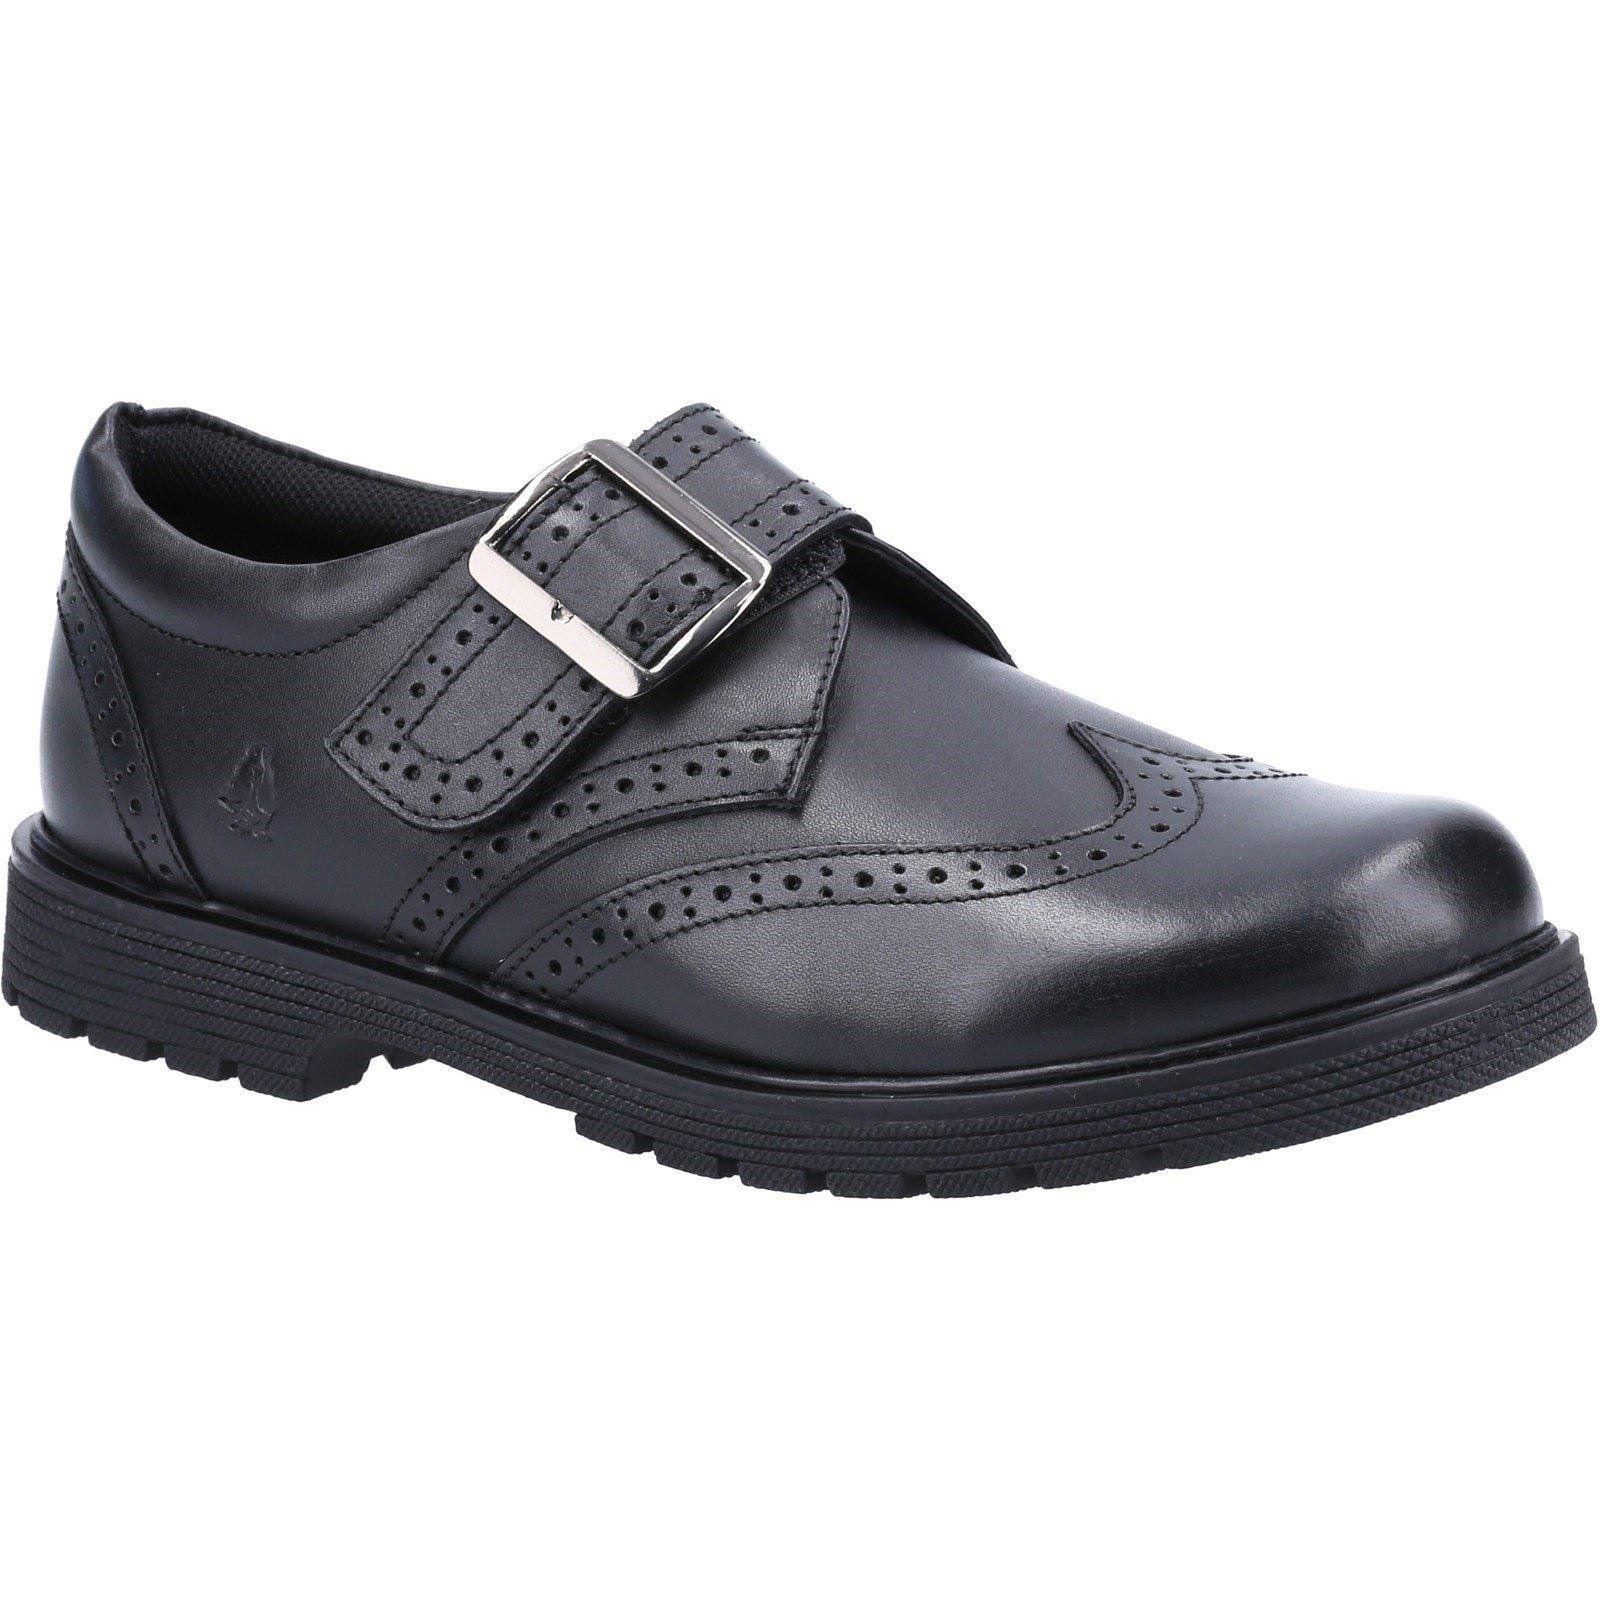 Hush Puppies Kid's Rhiannon Junior School Shoe Black 32625 - Black 11